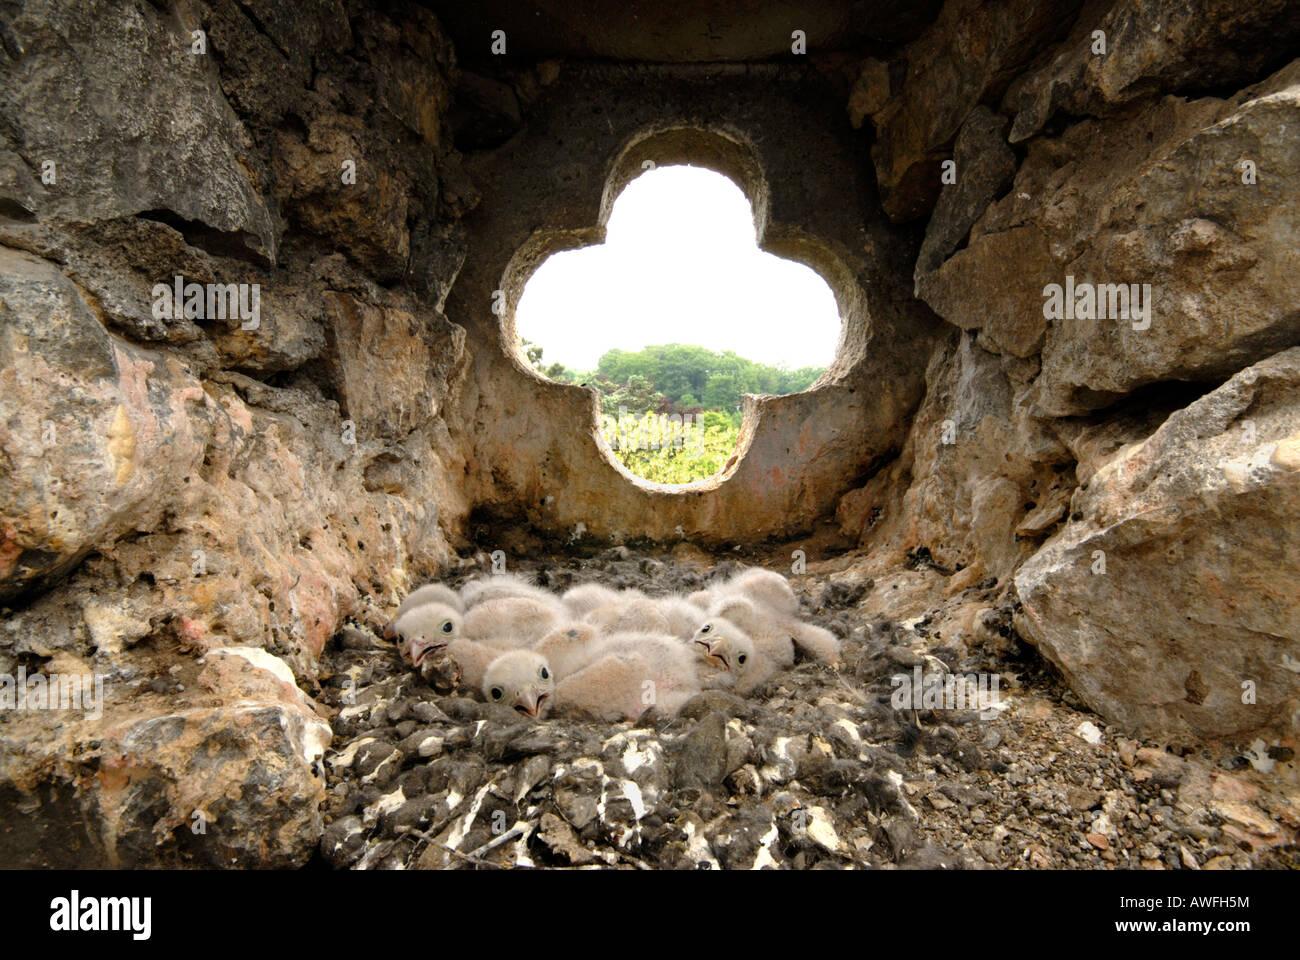 Nest voller Junge Turmfalken (Falco Tinnunculus) Stockfoto